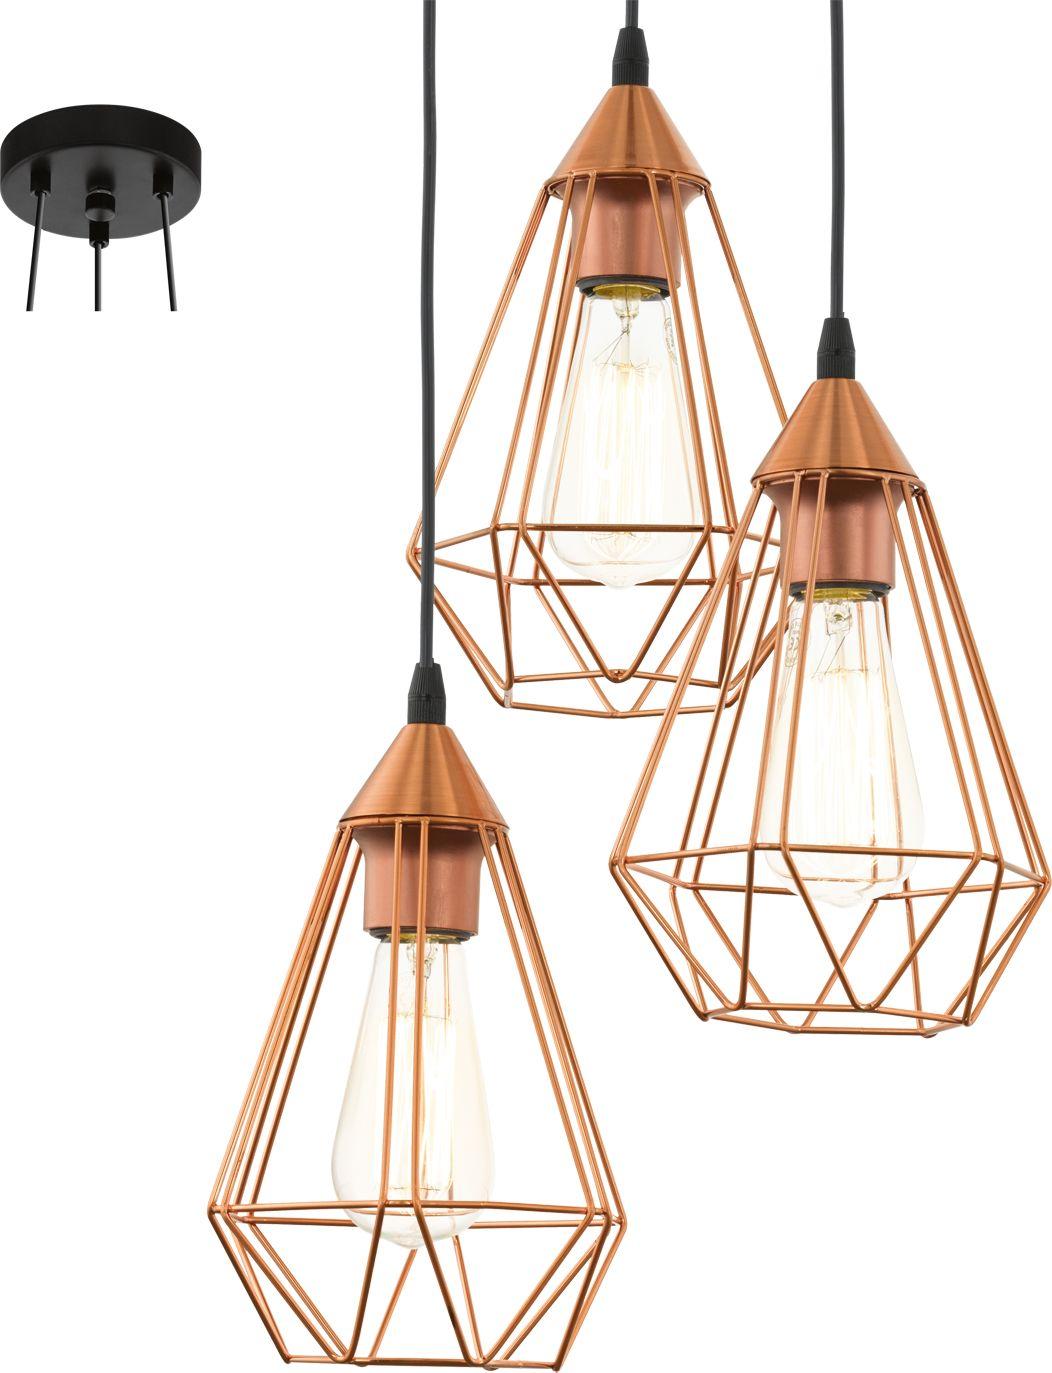 Eglo lampa wisząca Tarbes 94196 - SUPER OFERTA - RABAT w koszyku